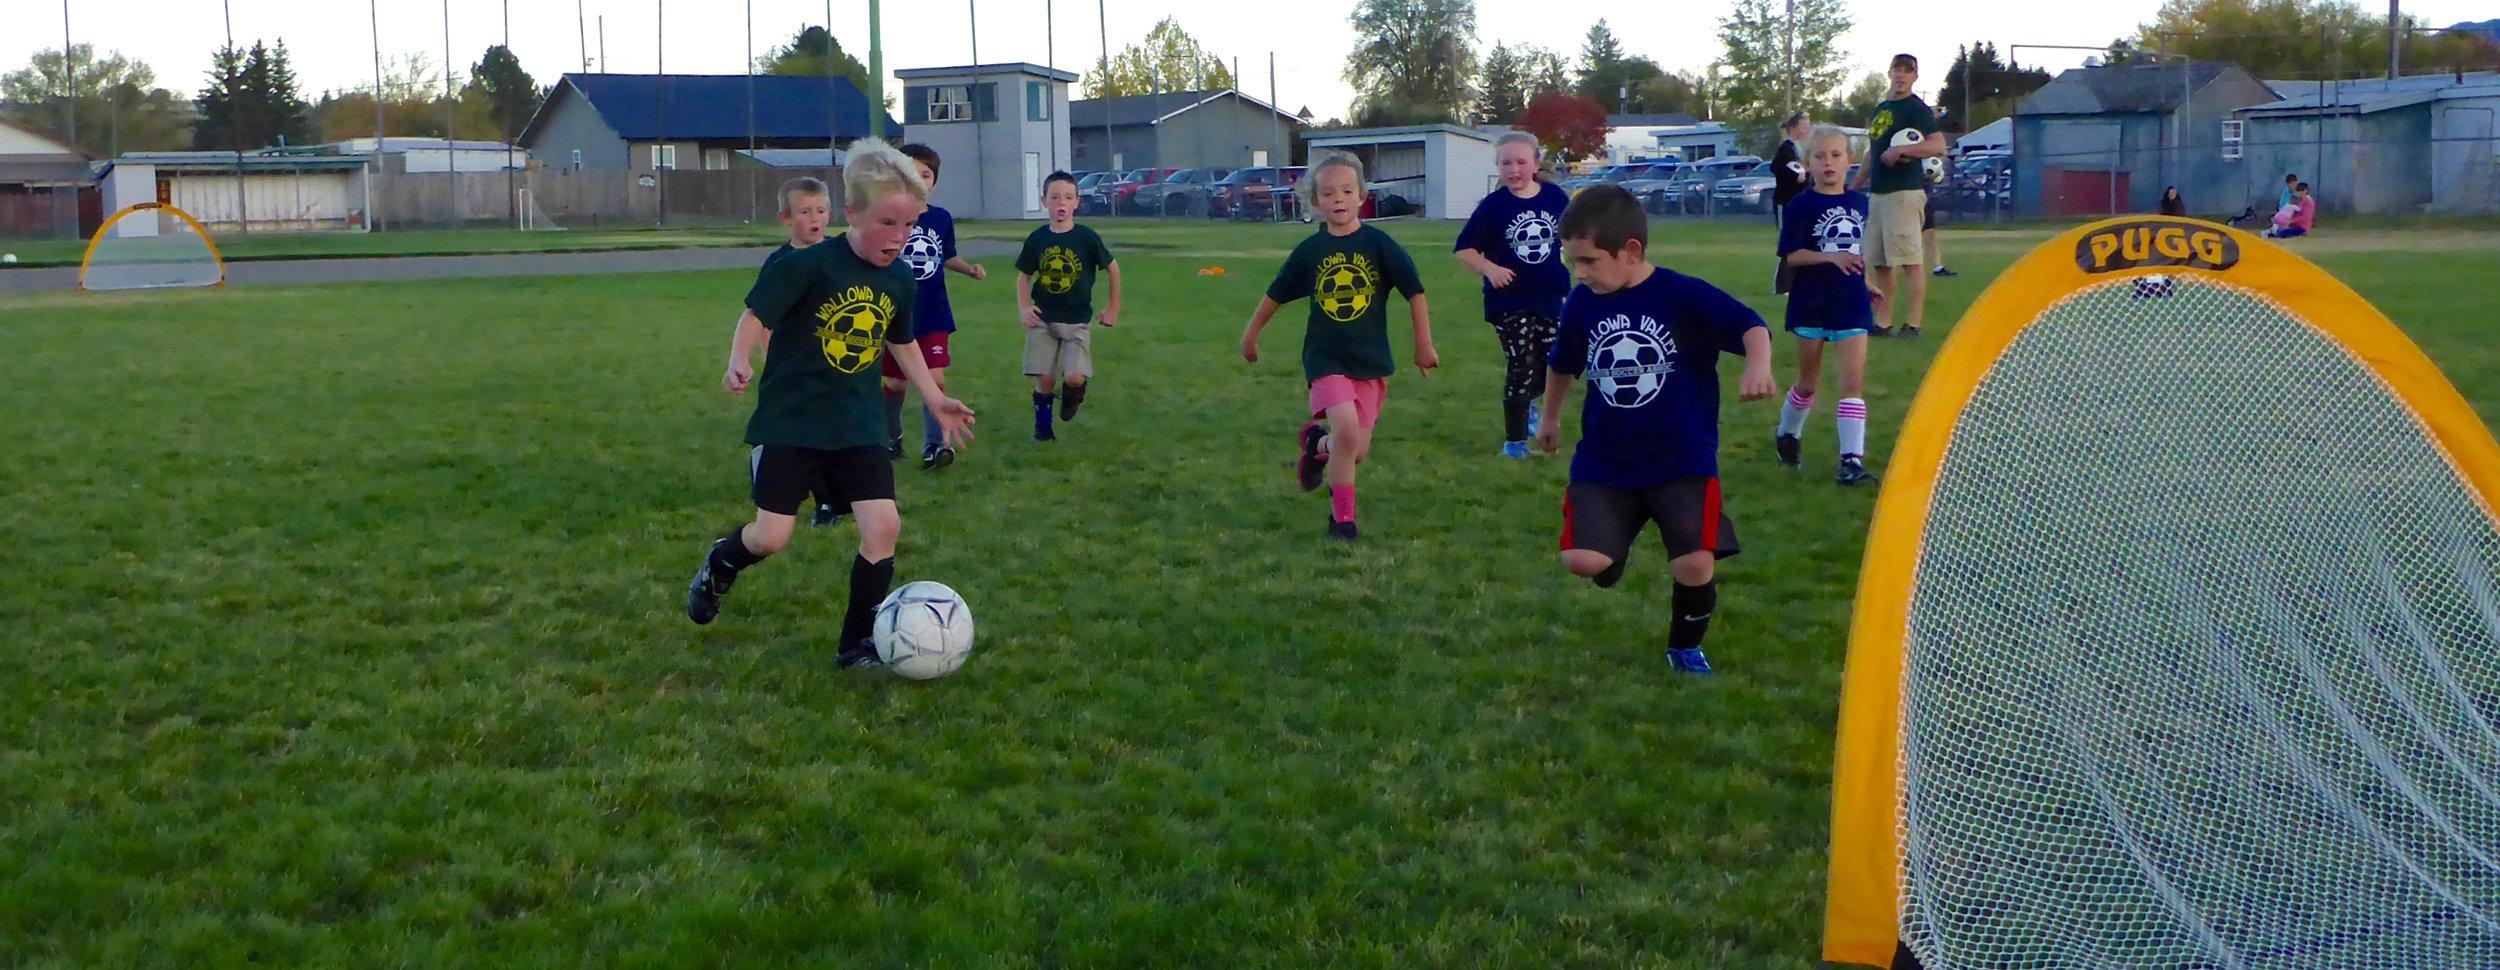 kids-soccer3.jpeg